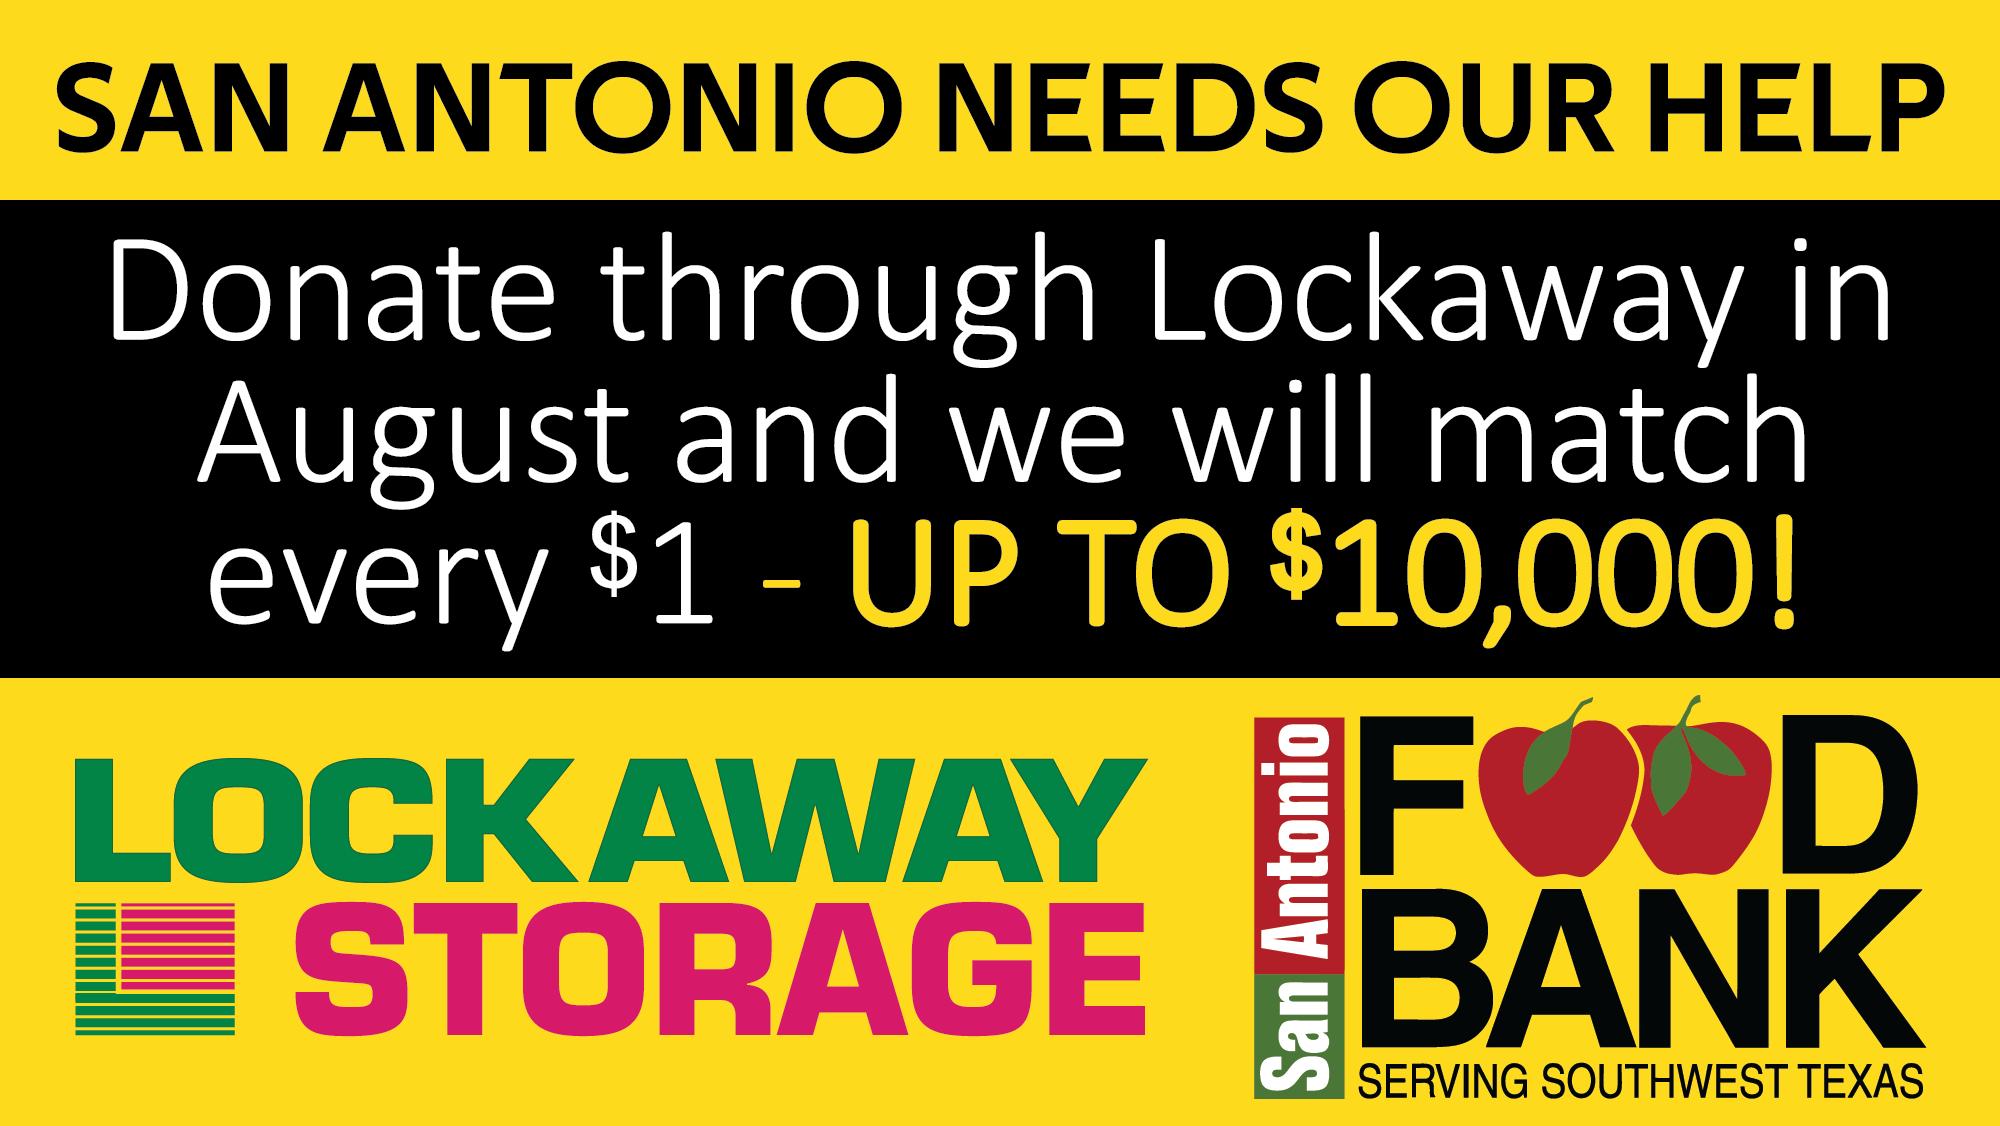 San Antonio Food Bank Needs Your Help